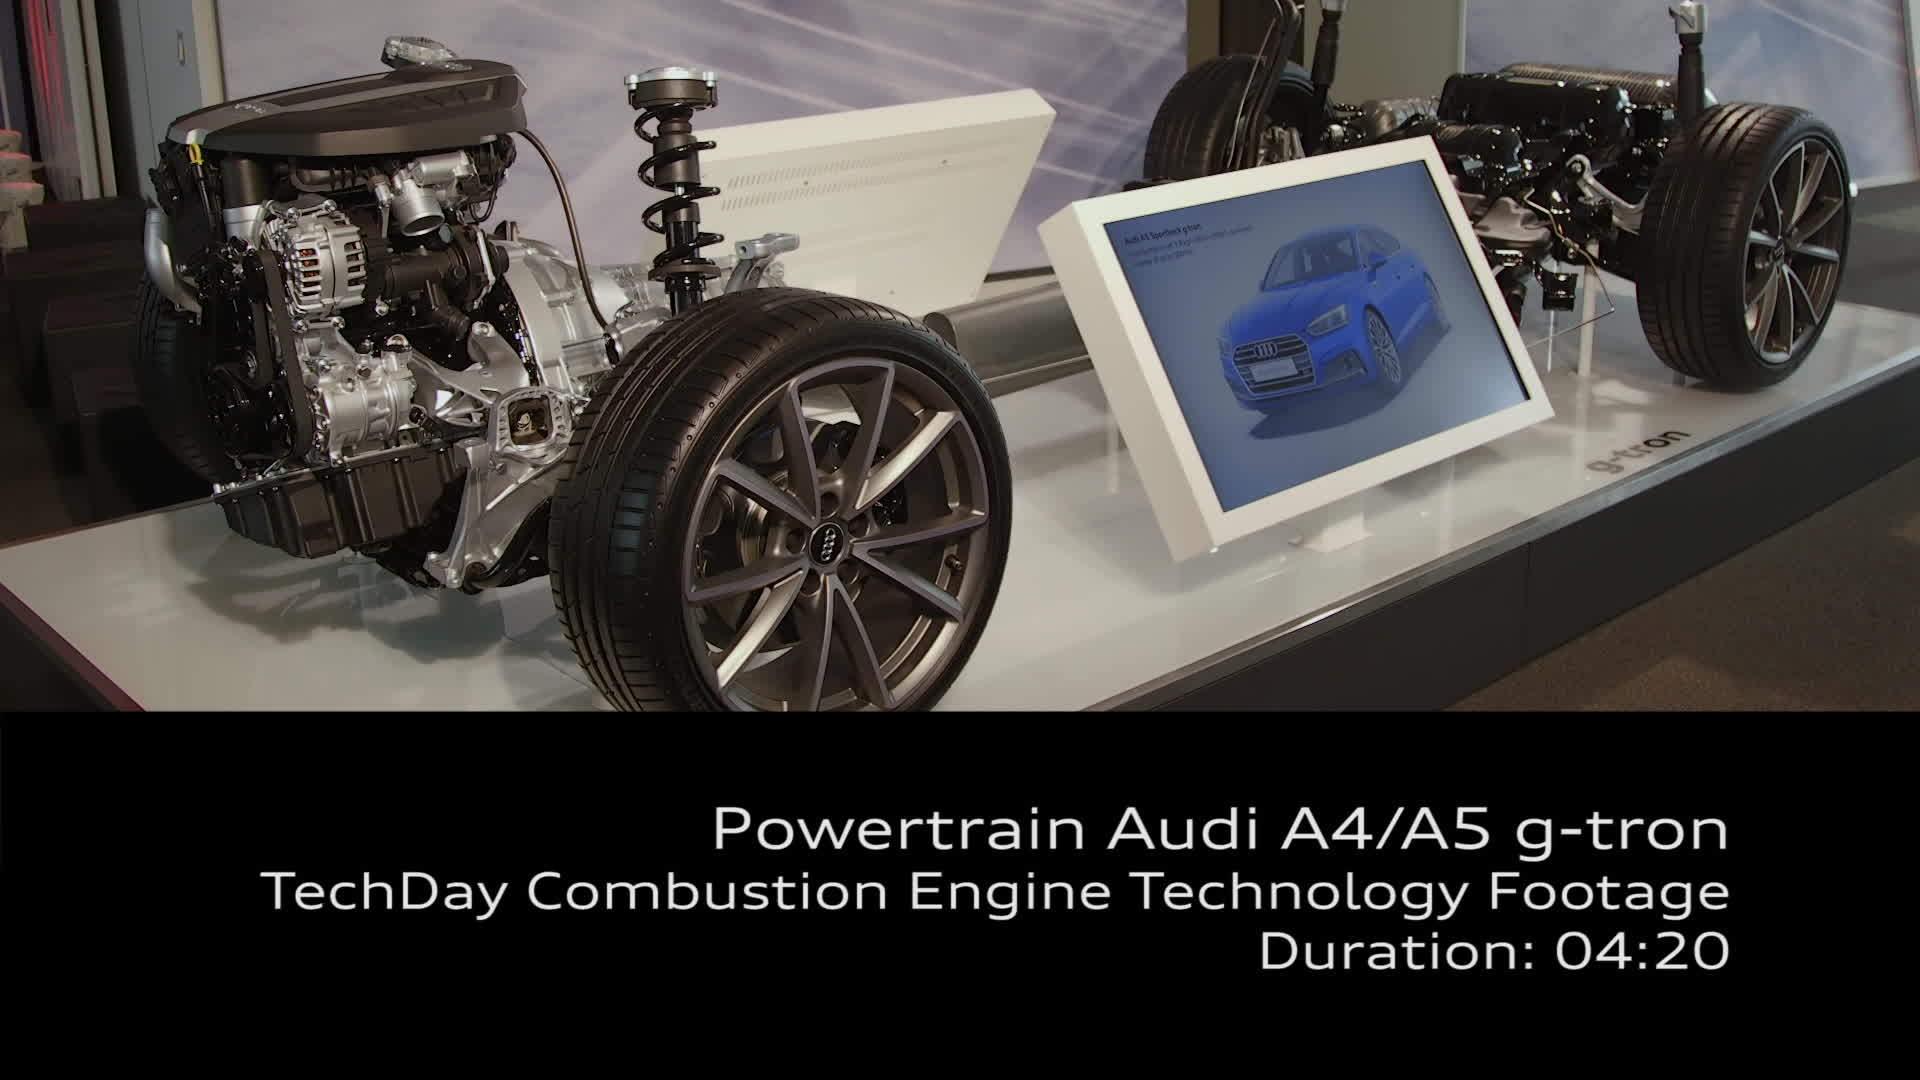 Footage powertrain Audi A4/A5 g-tron